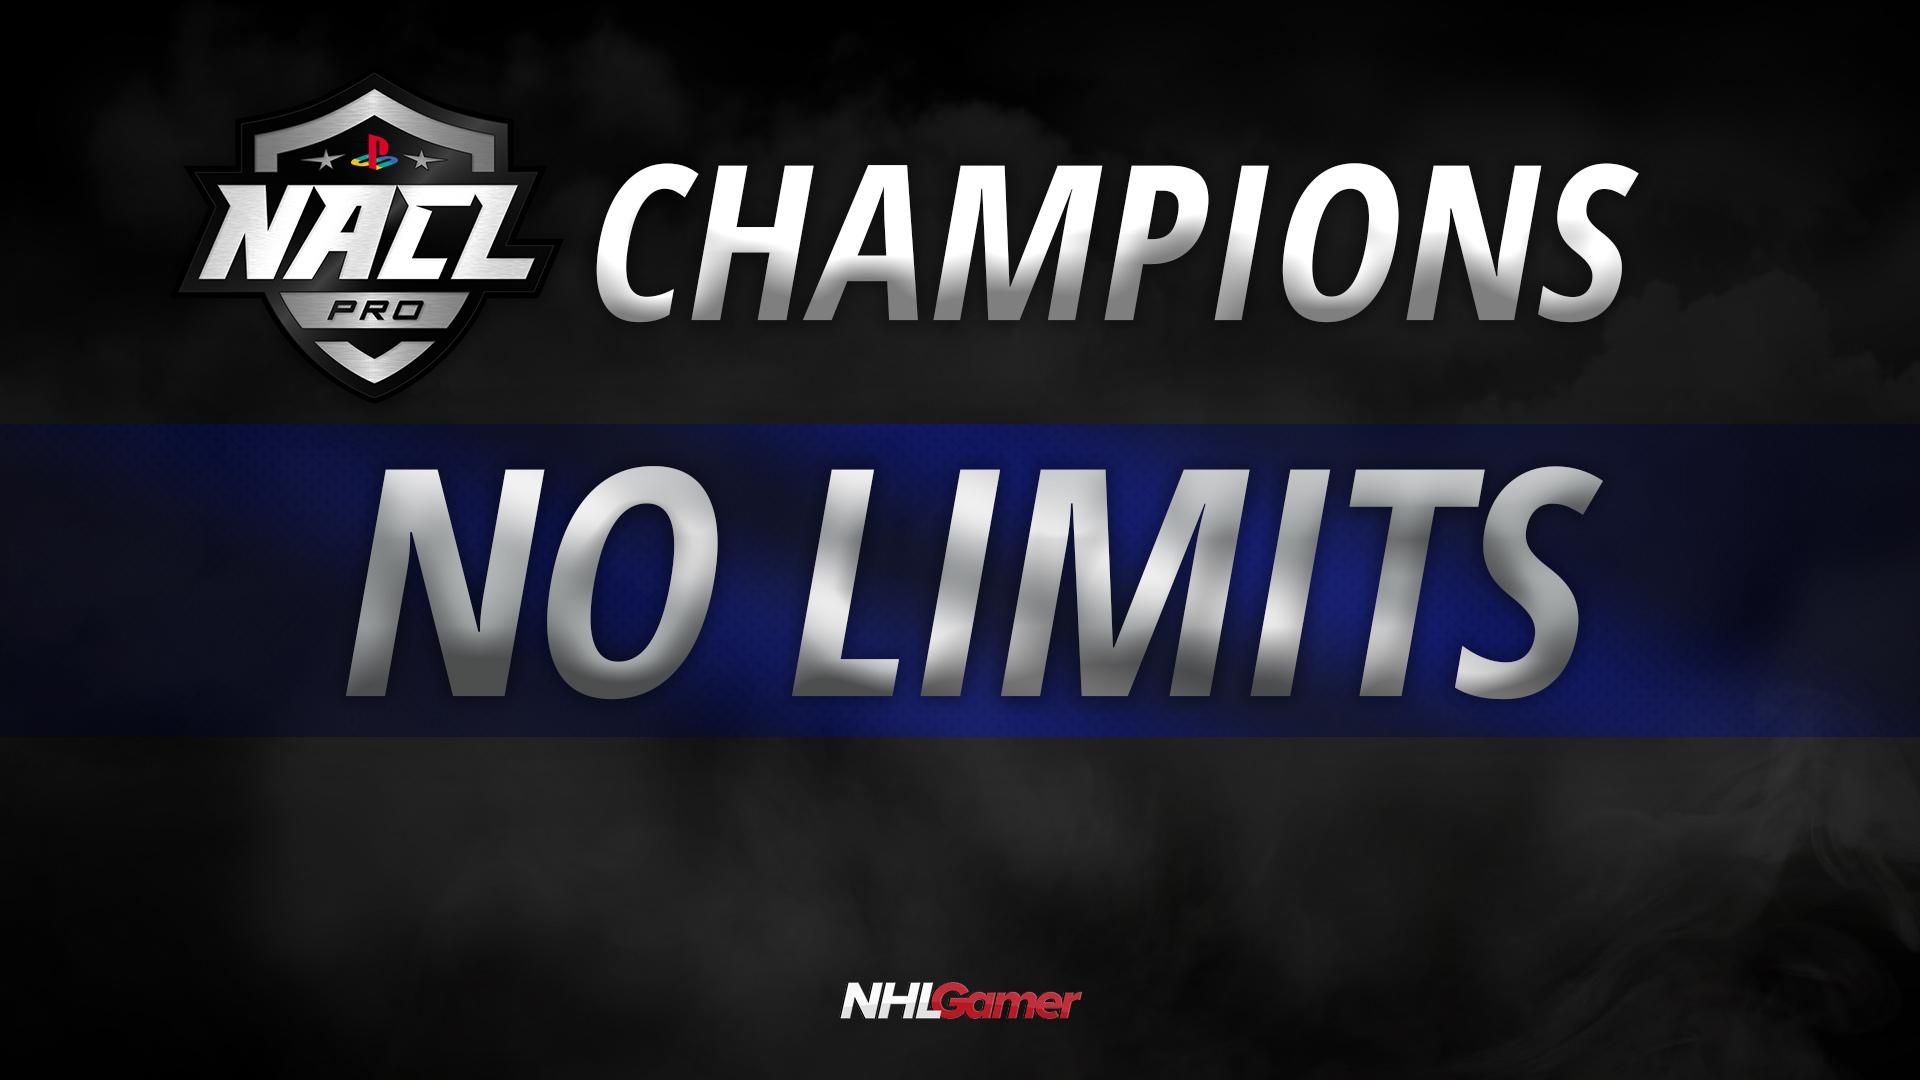 PS4_Pro_Champs_No_Limits.jpg